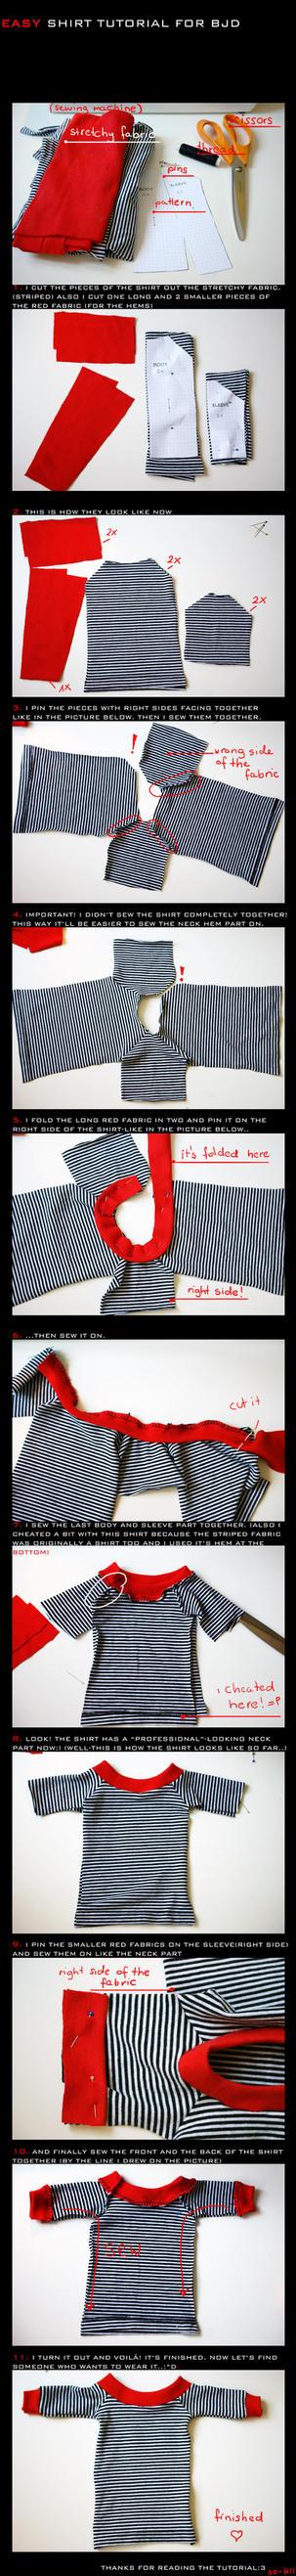 BJD shirt - TUTORIAL by so-fiii